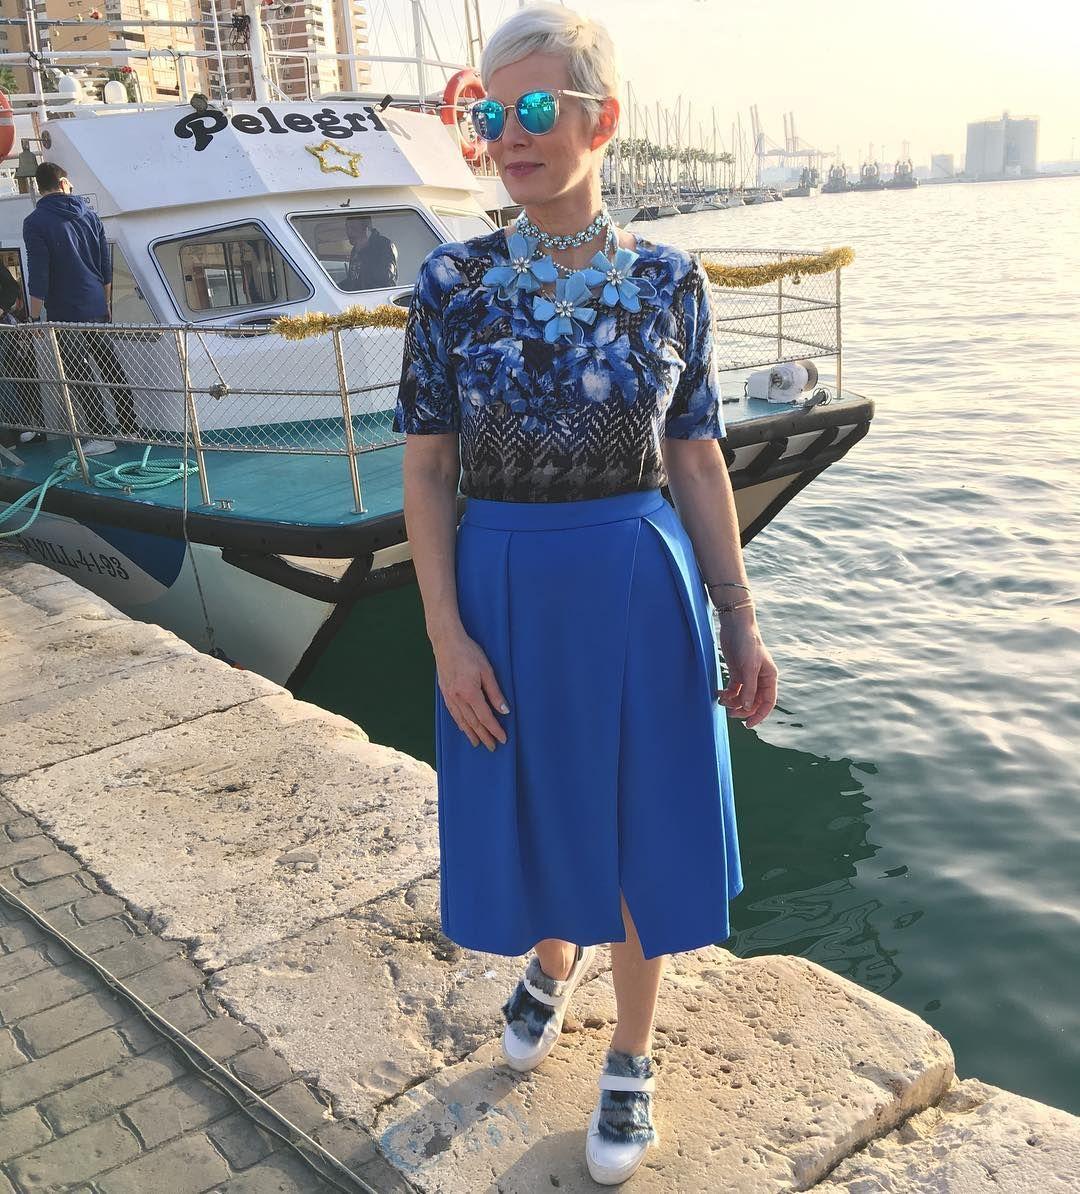 ImageStylist/Color Conoisseur/Personal shopper/Creative Wardrobe Consultant/Brandambassador @soreina.beyoux